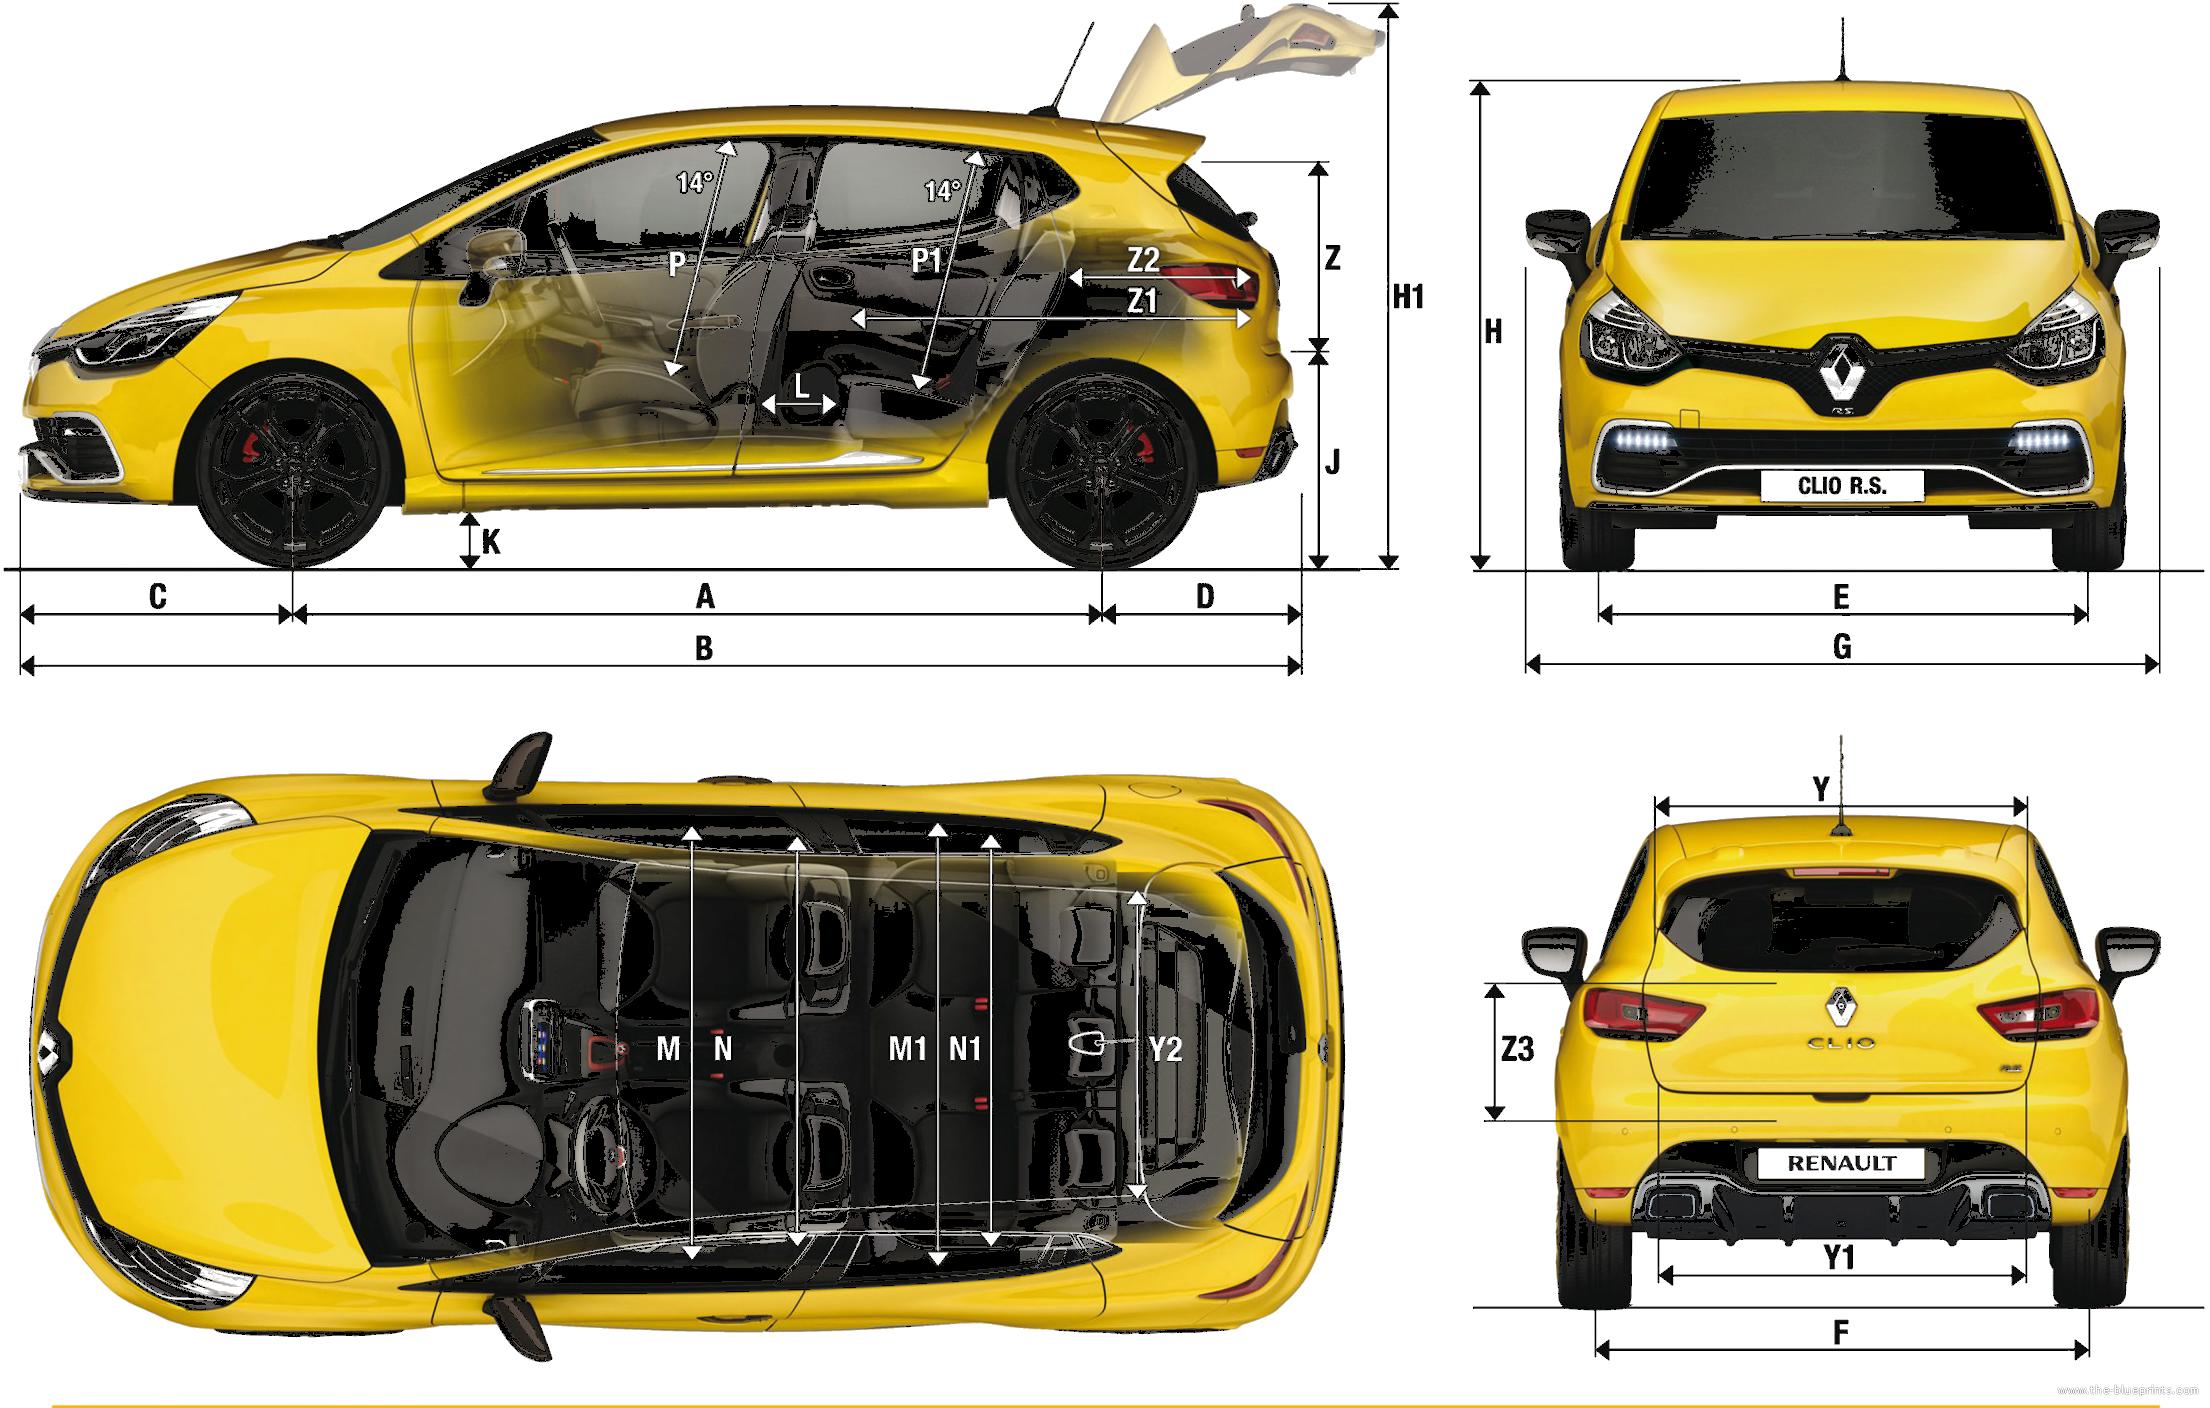 renault clio dimensions car reviews 2018. Black Bedroom Furniture Sets. Home Design Ideas